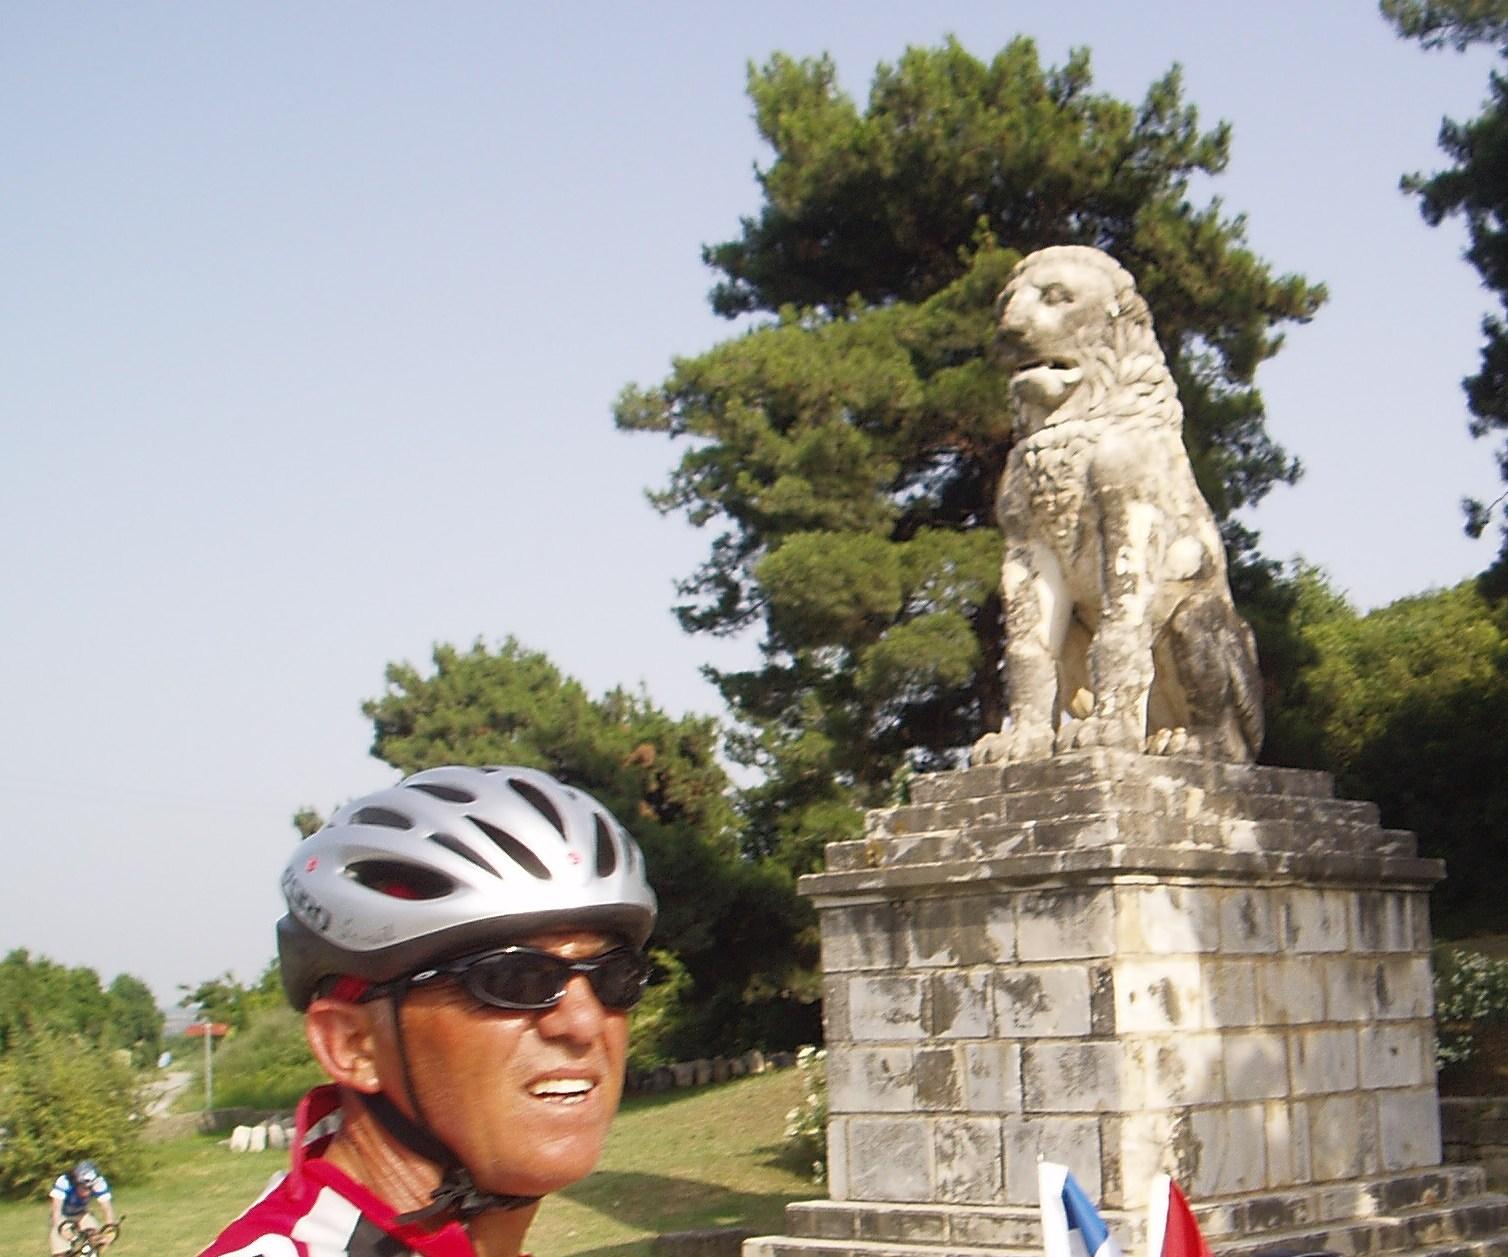 copy-2-of-turkey-greece-bike-ride-053